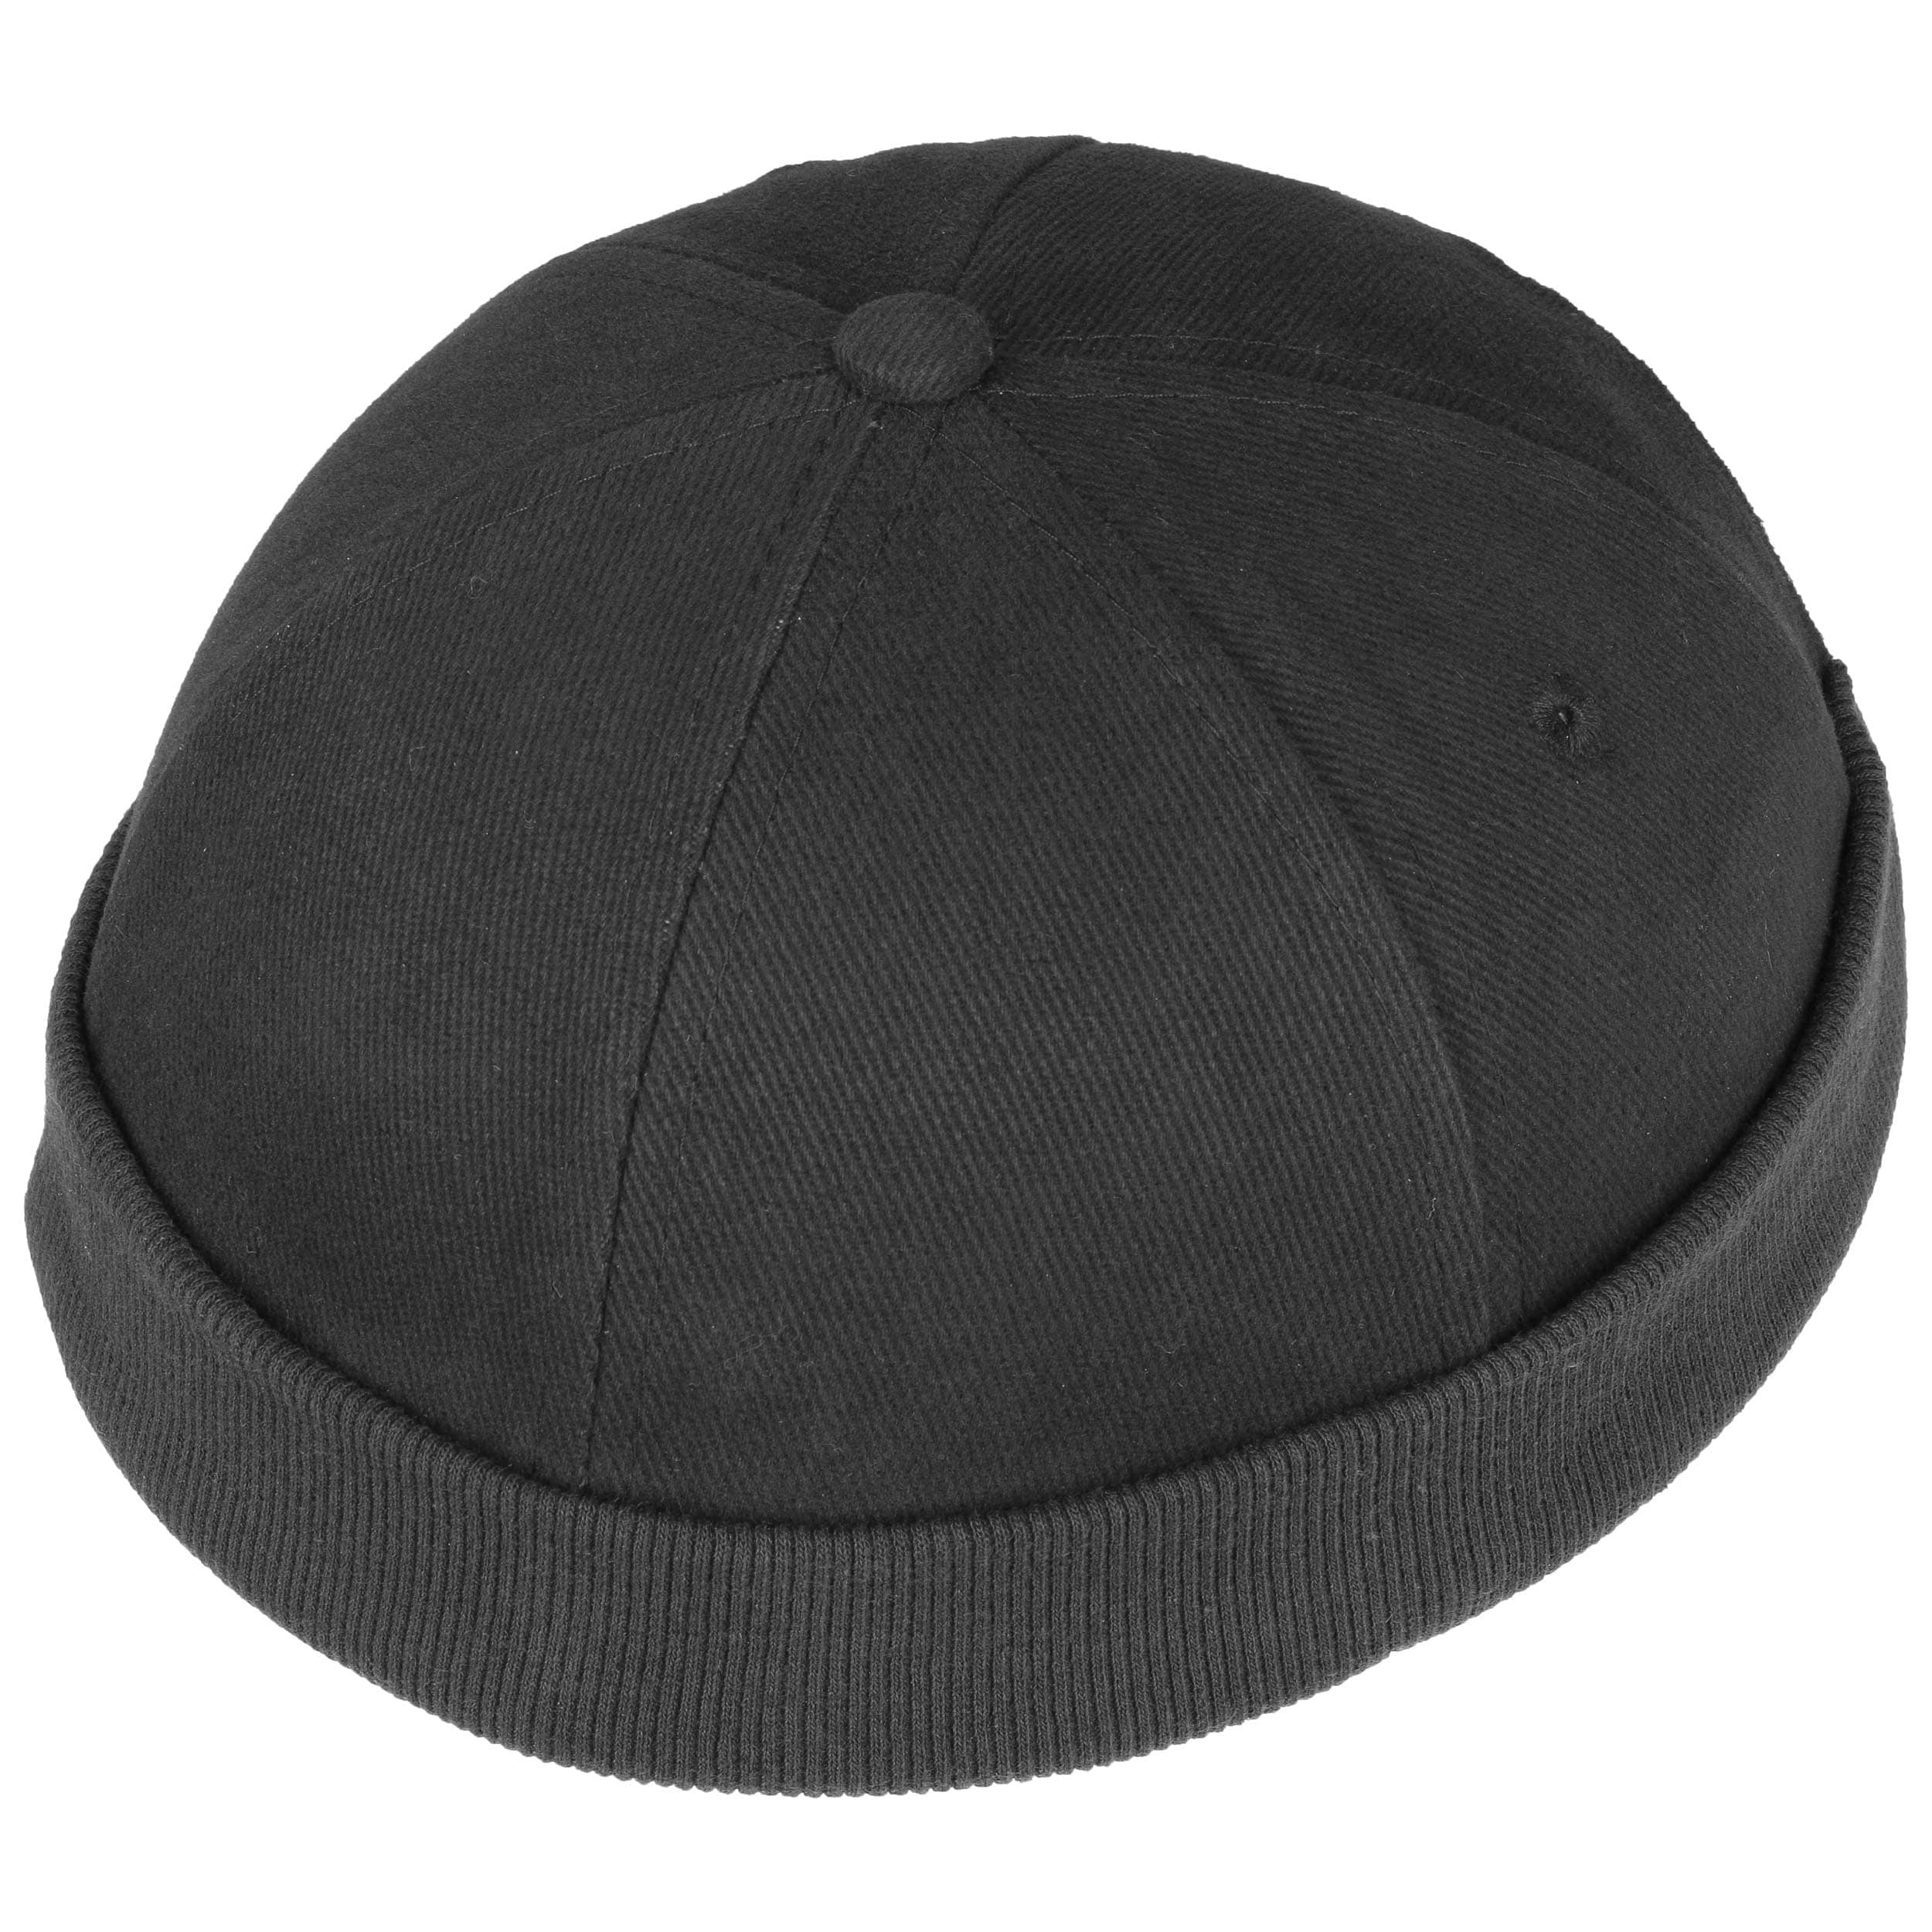 888b8a95d9f ... Cotton Docker Cap - black 1 ...